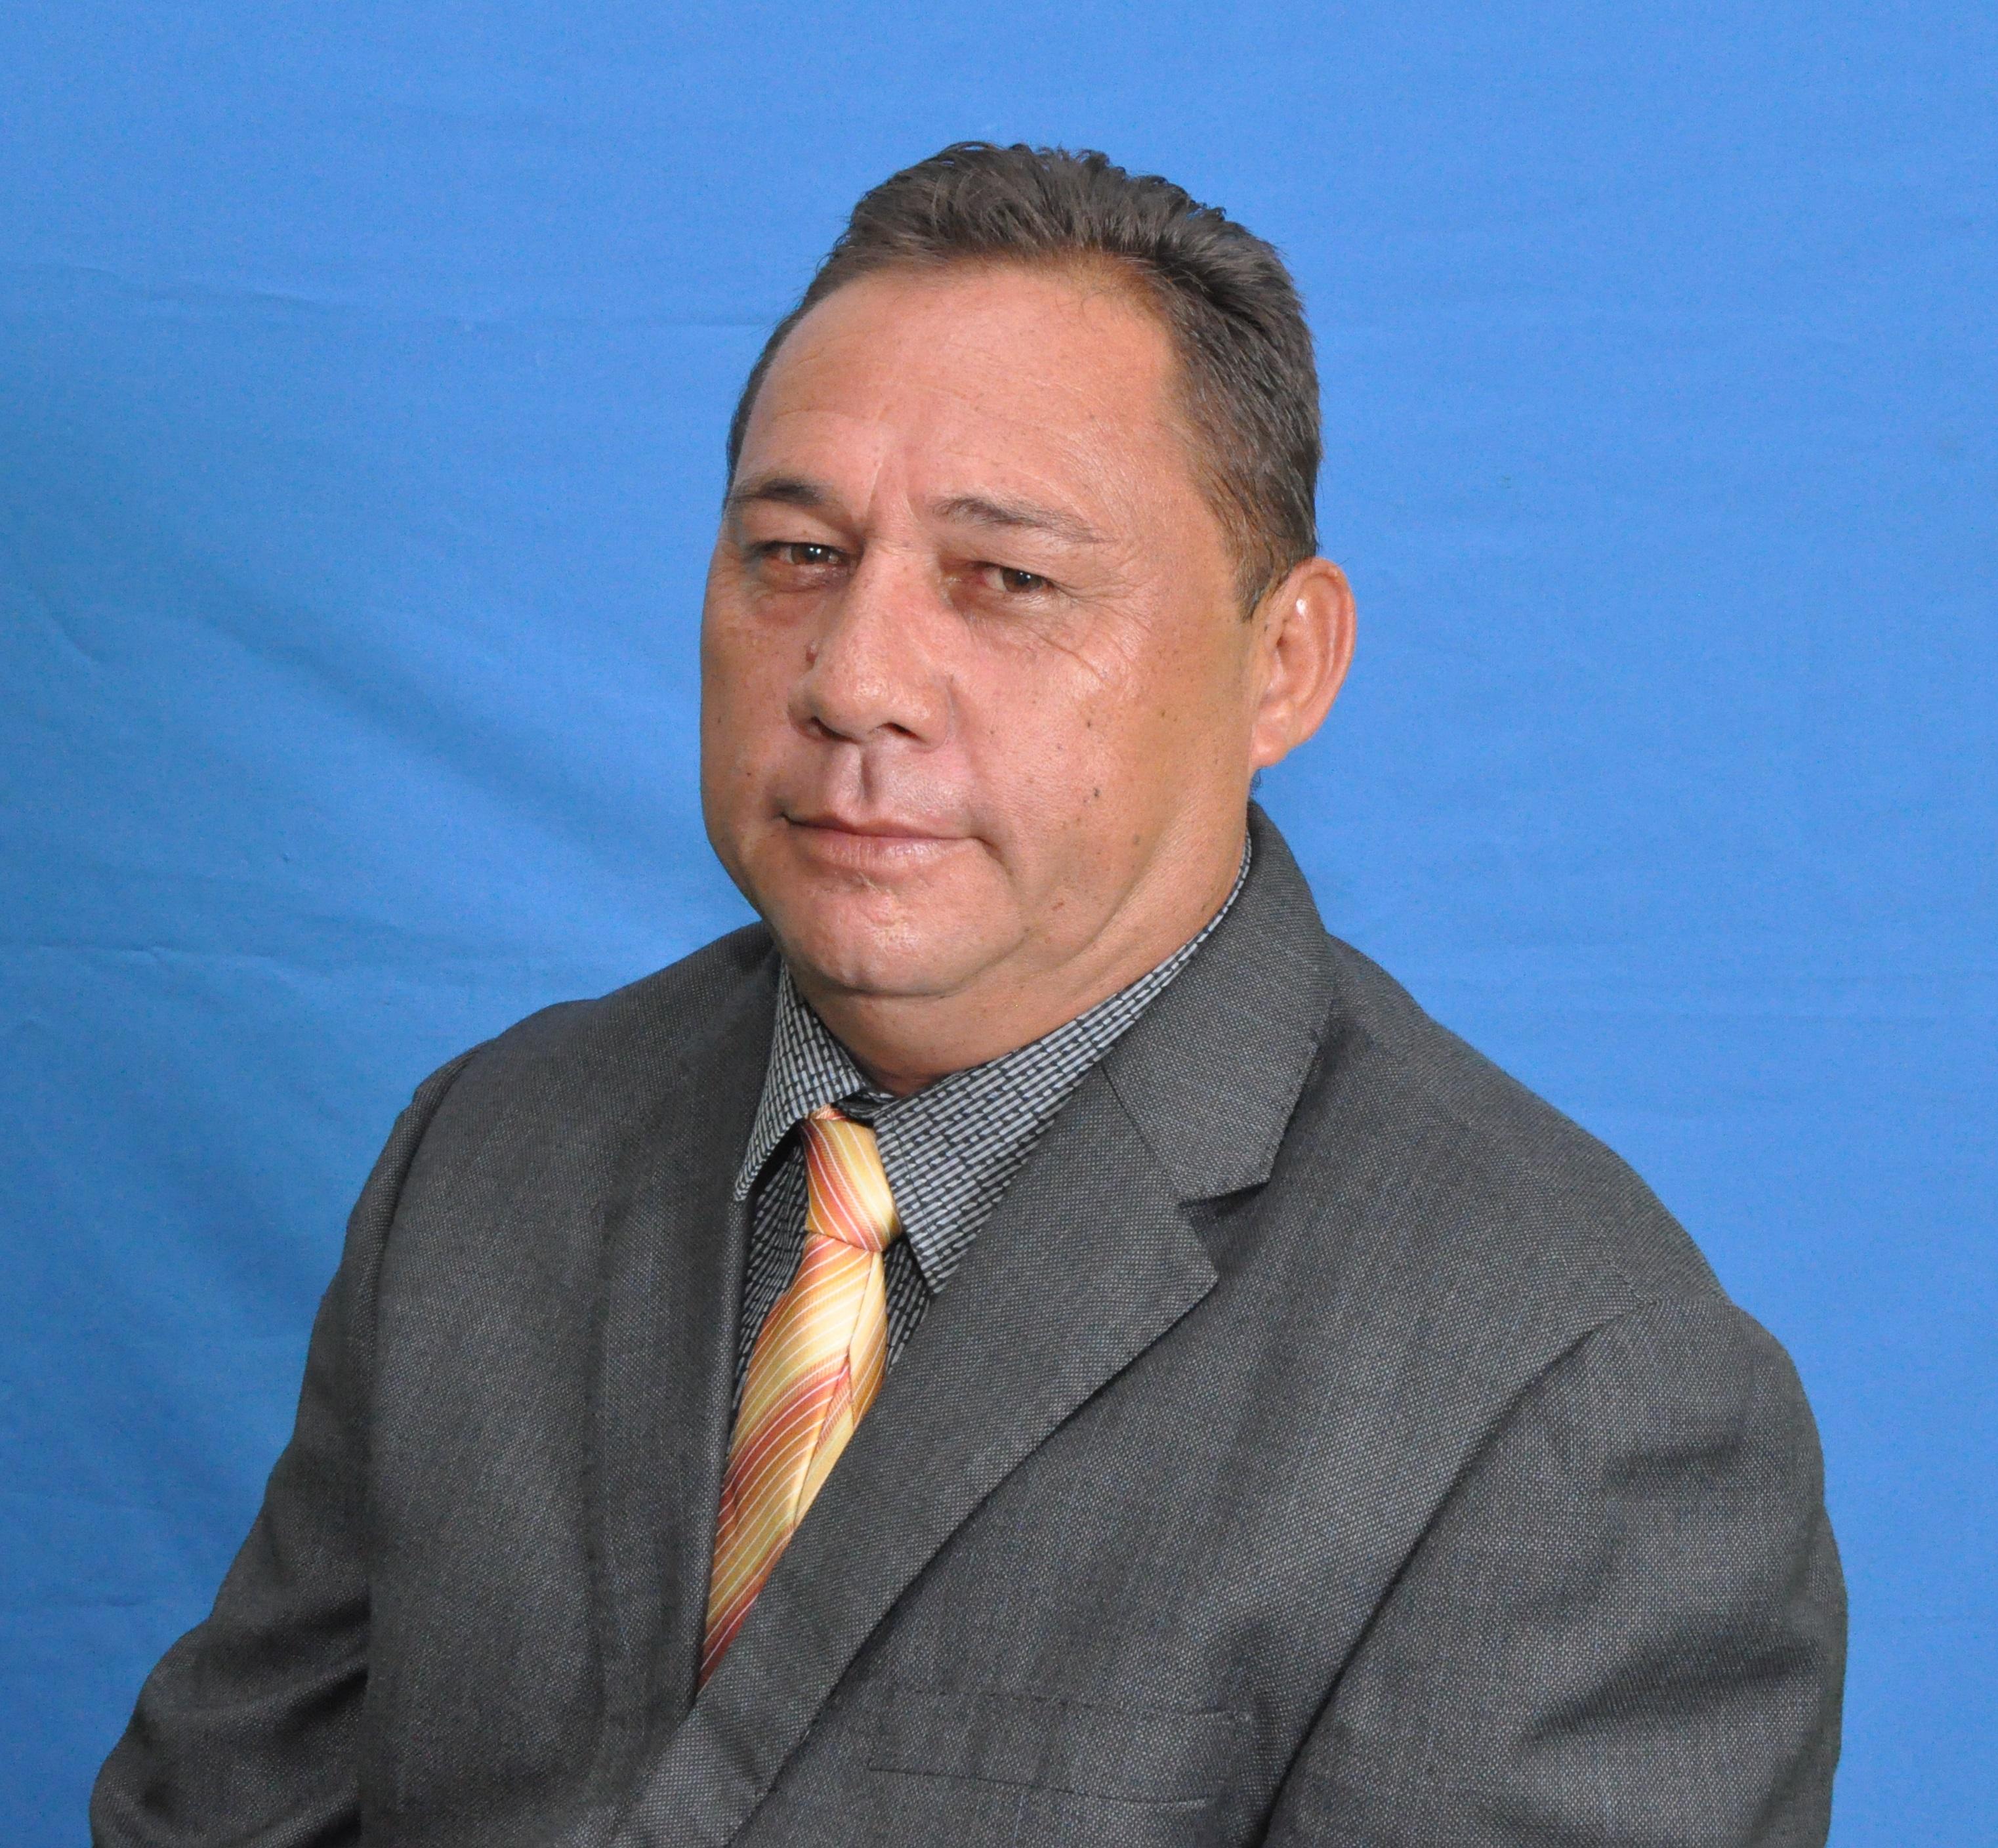 Flávio Jean Araújo Gonçalves